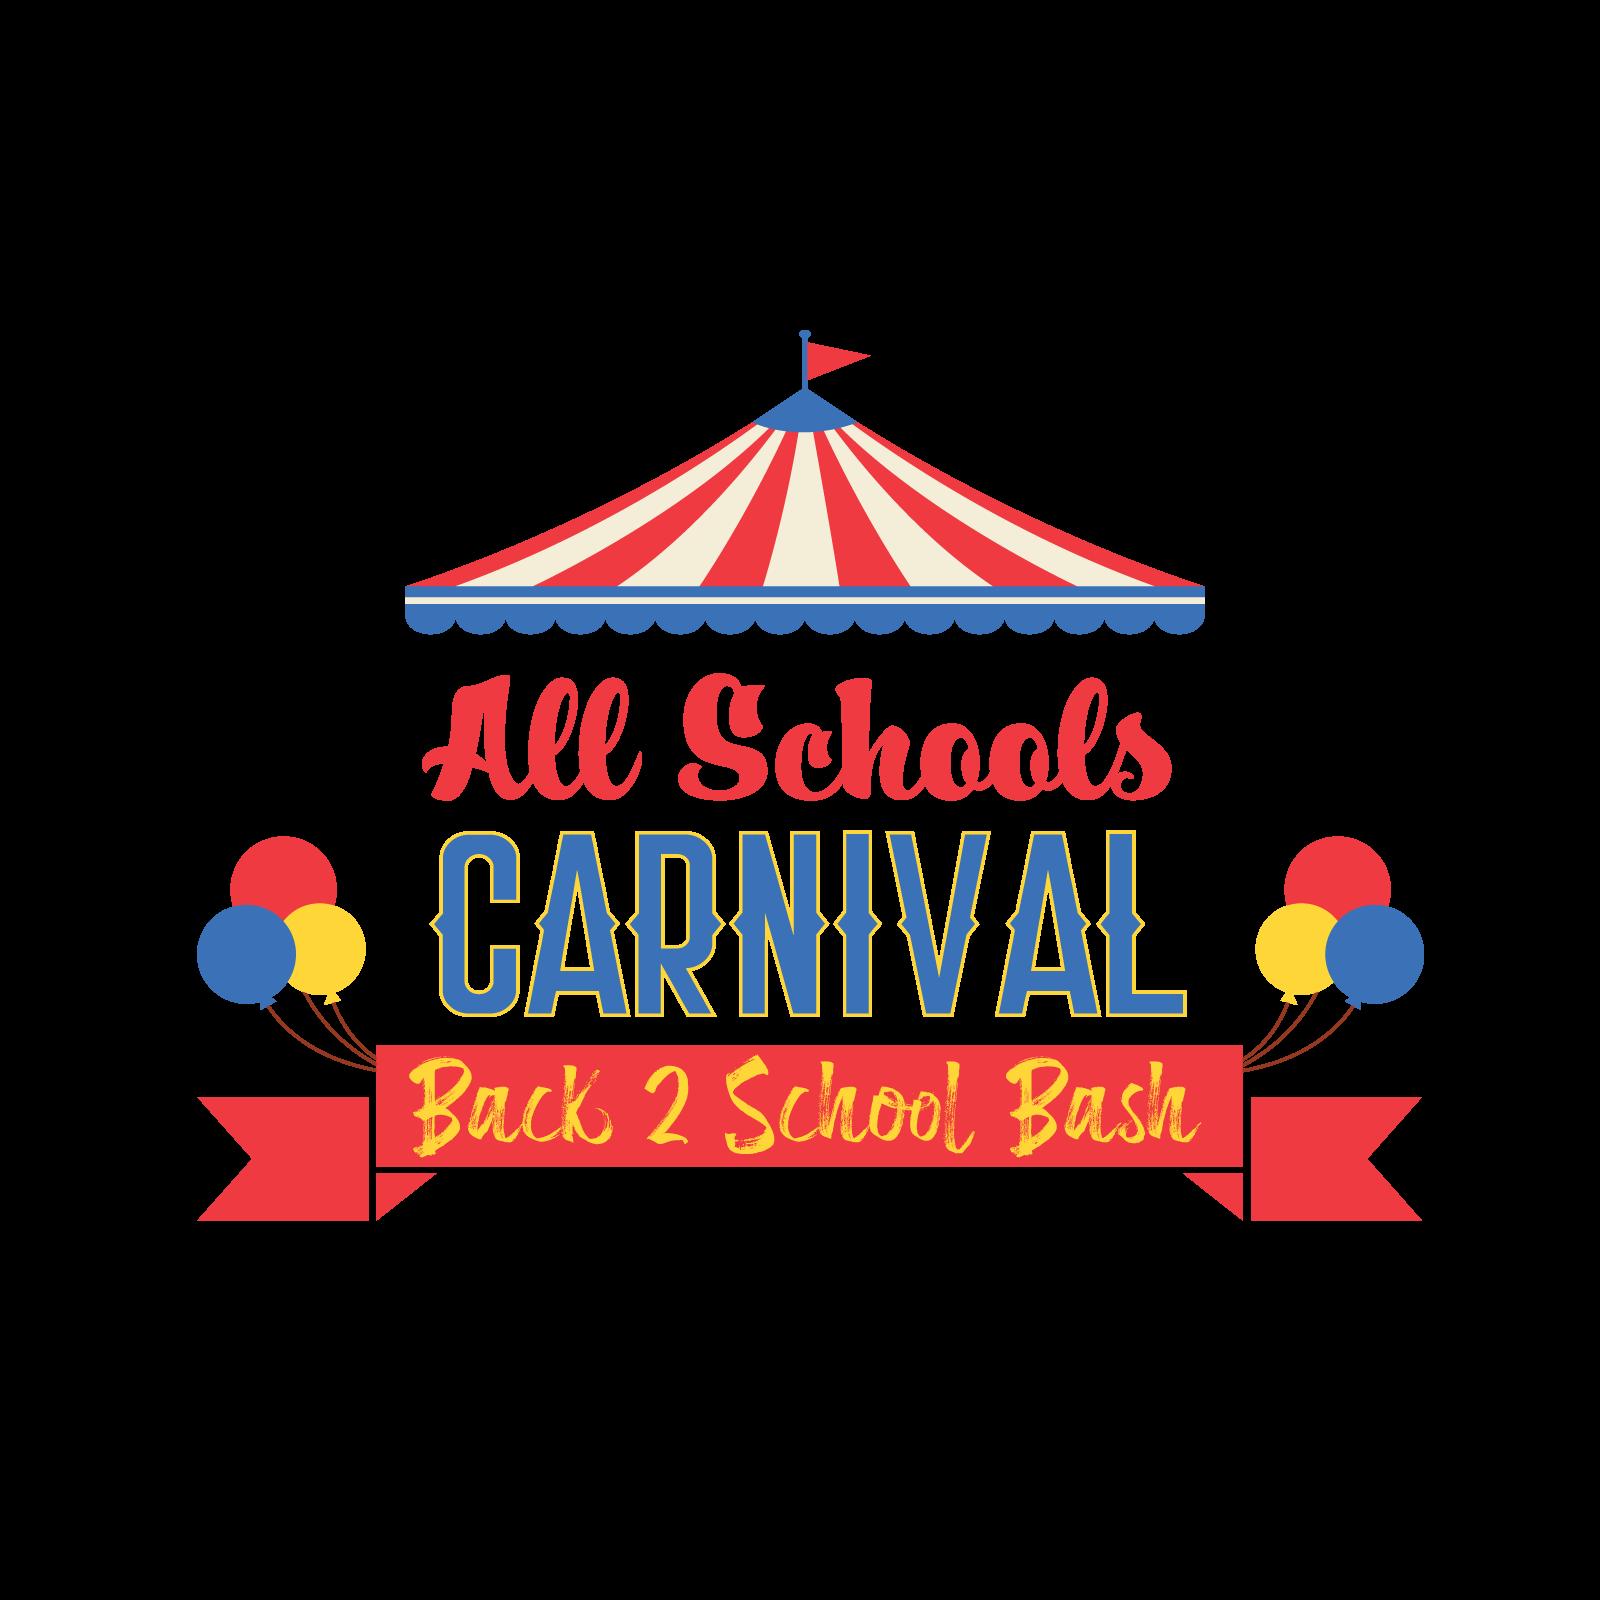 All Schools Carnival